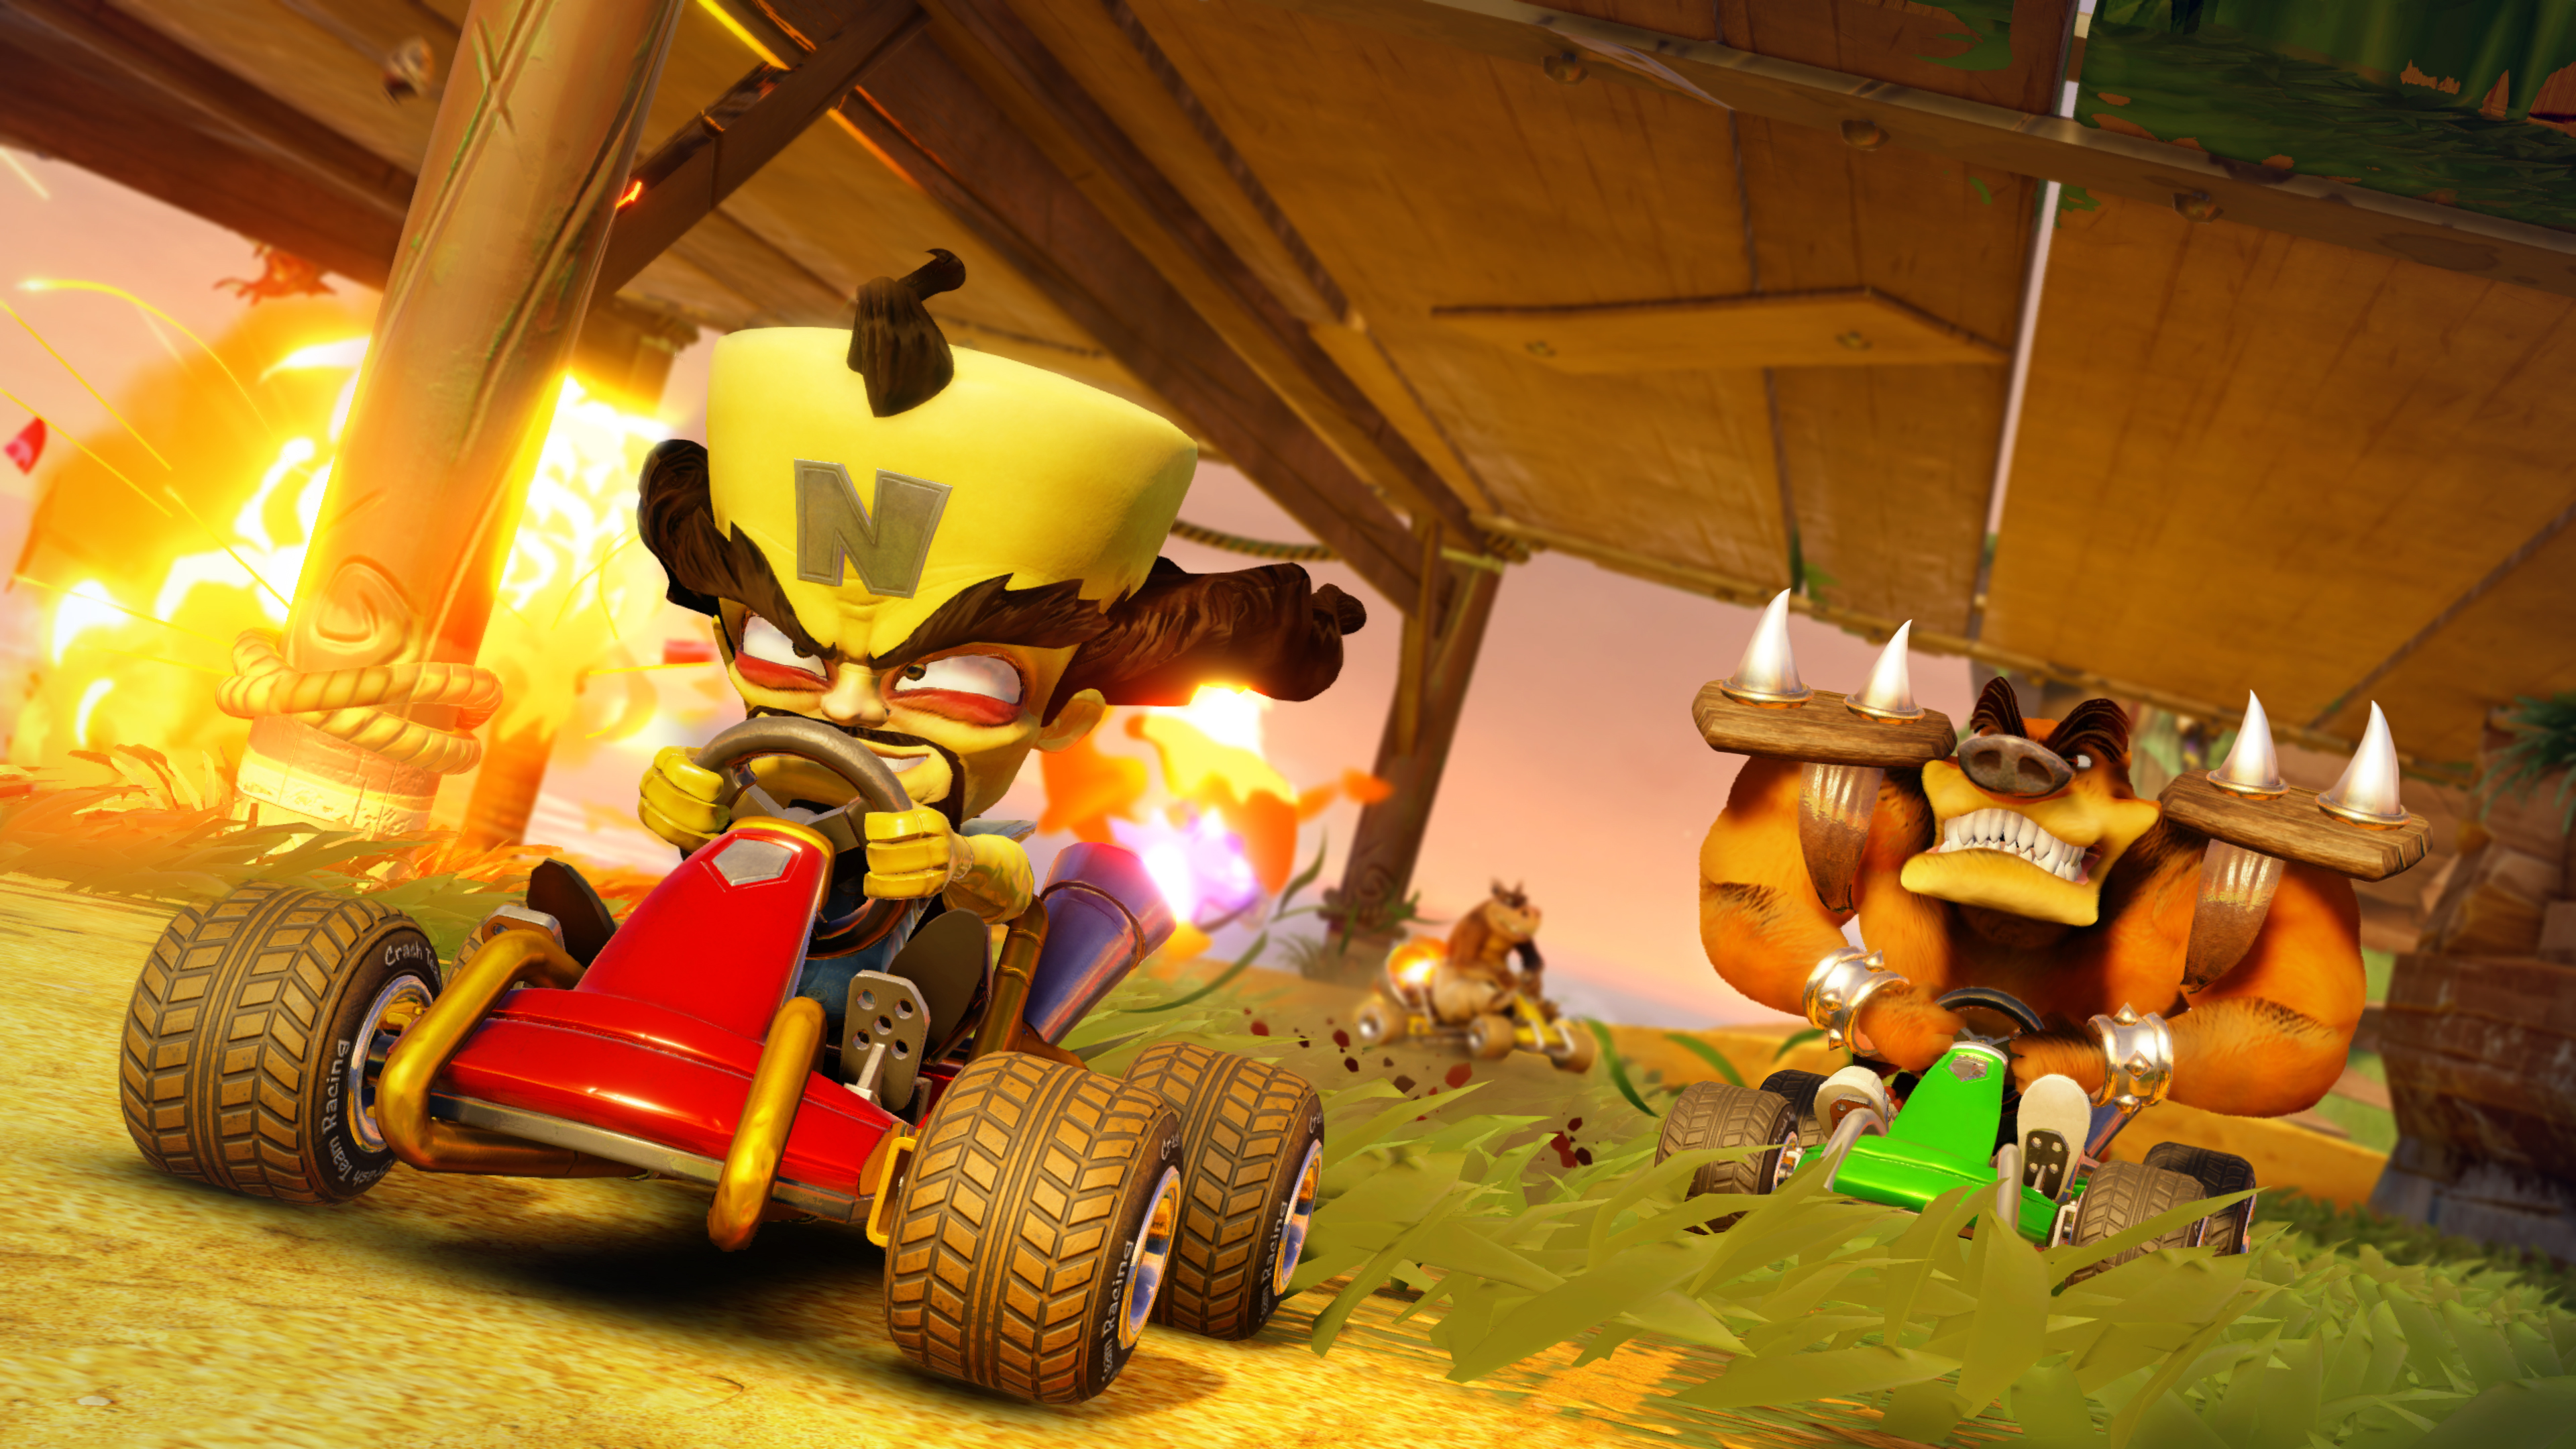 Crash Team Racing shortcuts: All the hidden paths in Nitro